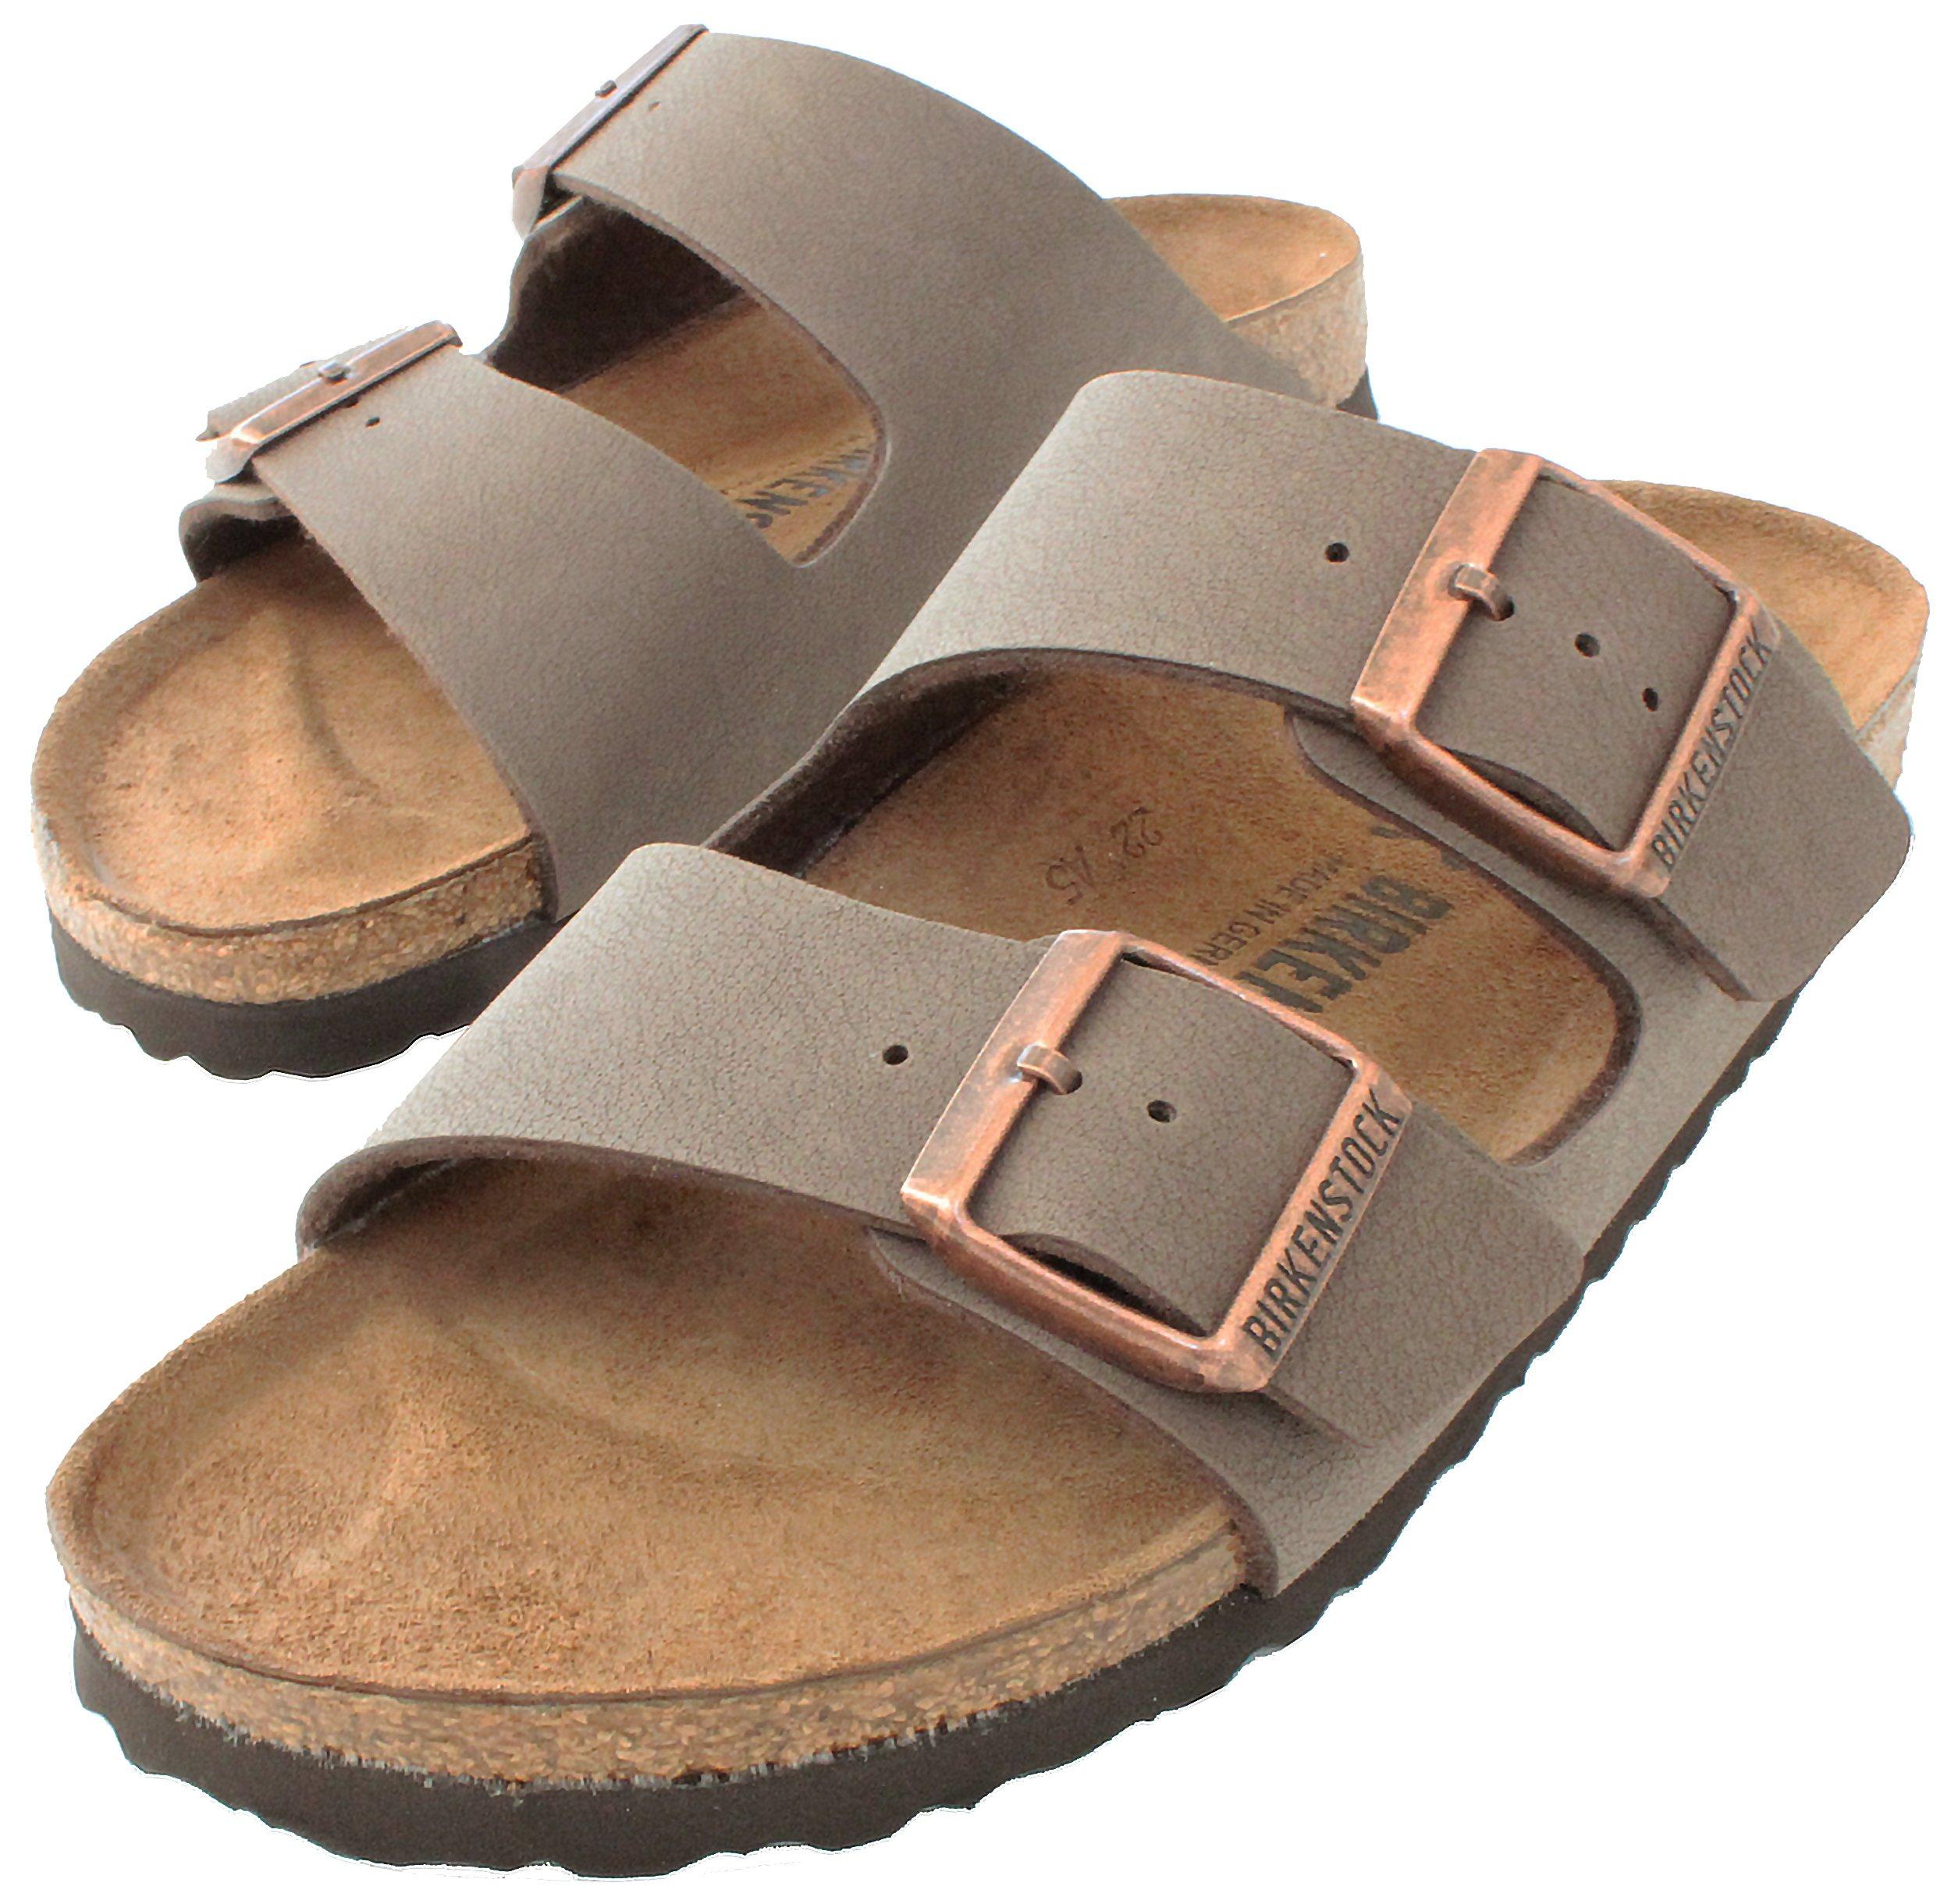 Birkenstock Arizona 'Narrow Fit' (Women's) Cork Footbed Sandals, Mocha, 41 N EU (10-10.5 N US Women)